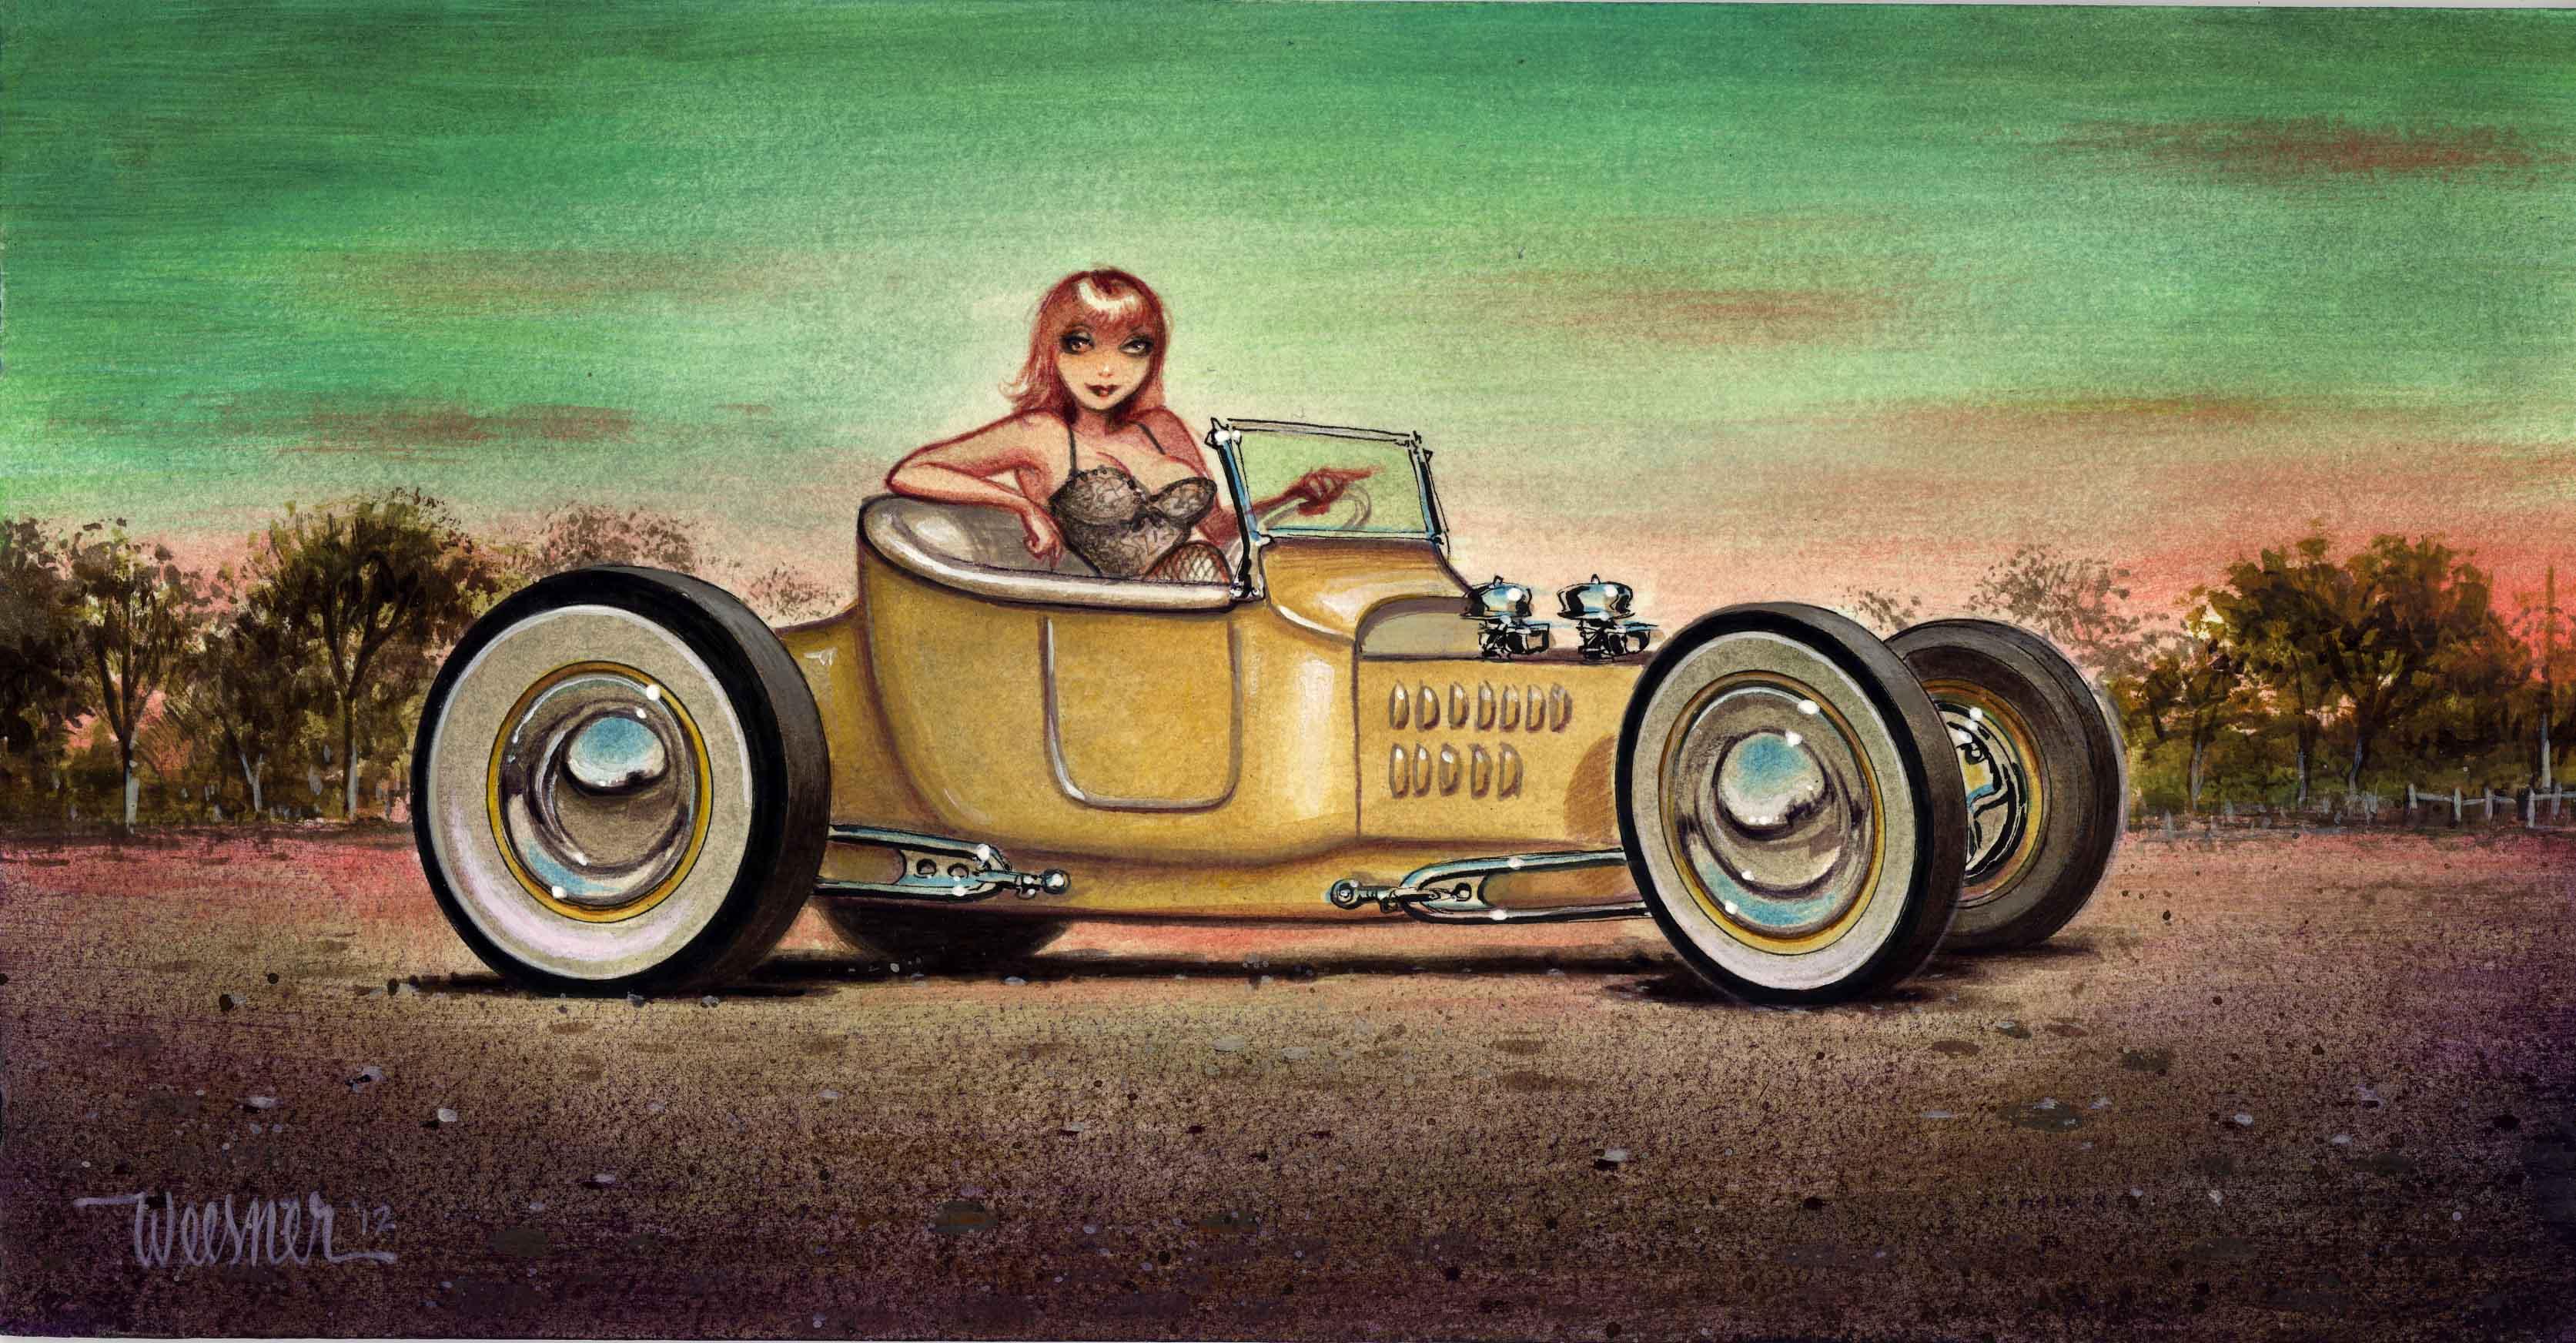 Pin Up Girl Art Vintage Wallpaper Hot Rod Artist Keith Weesner Hot Rod Network